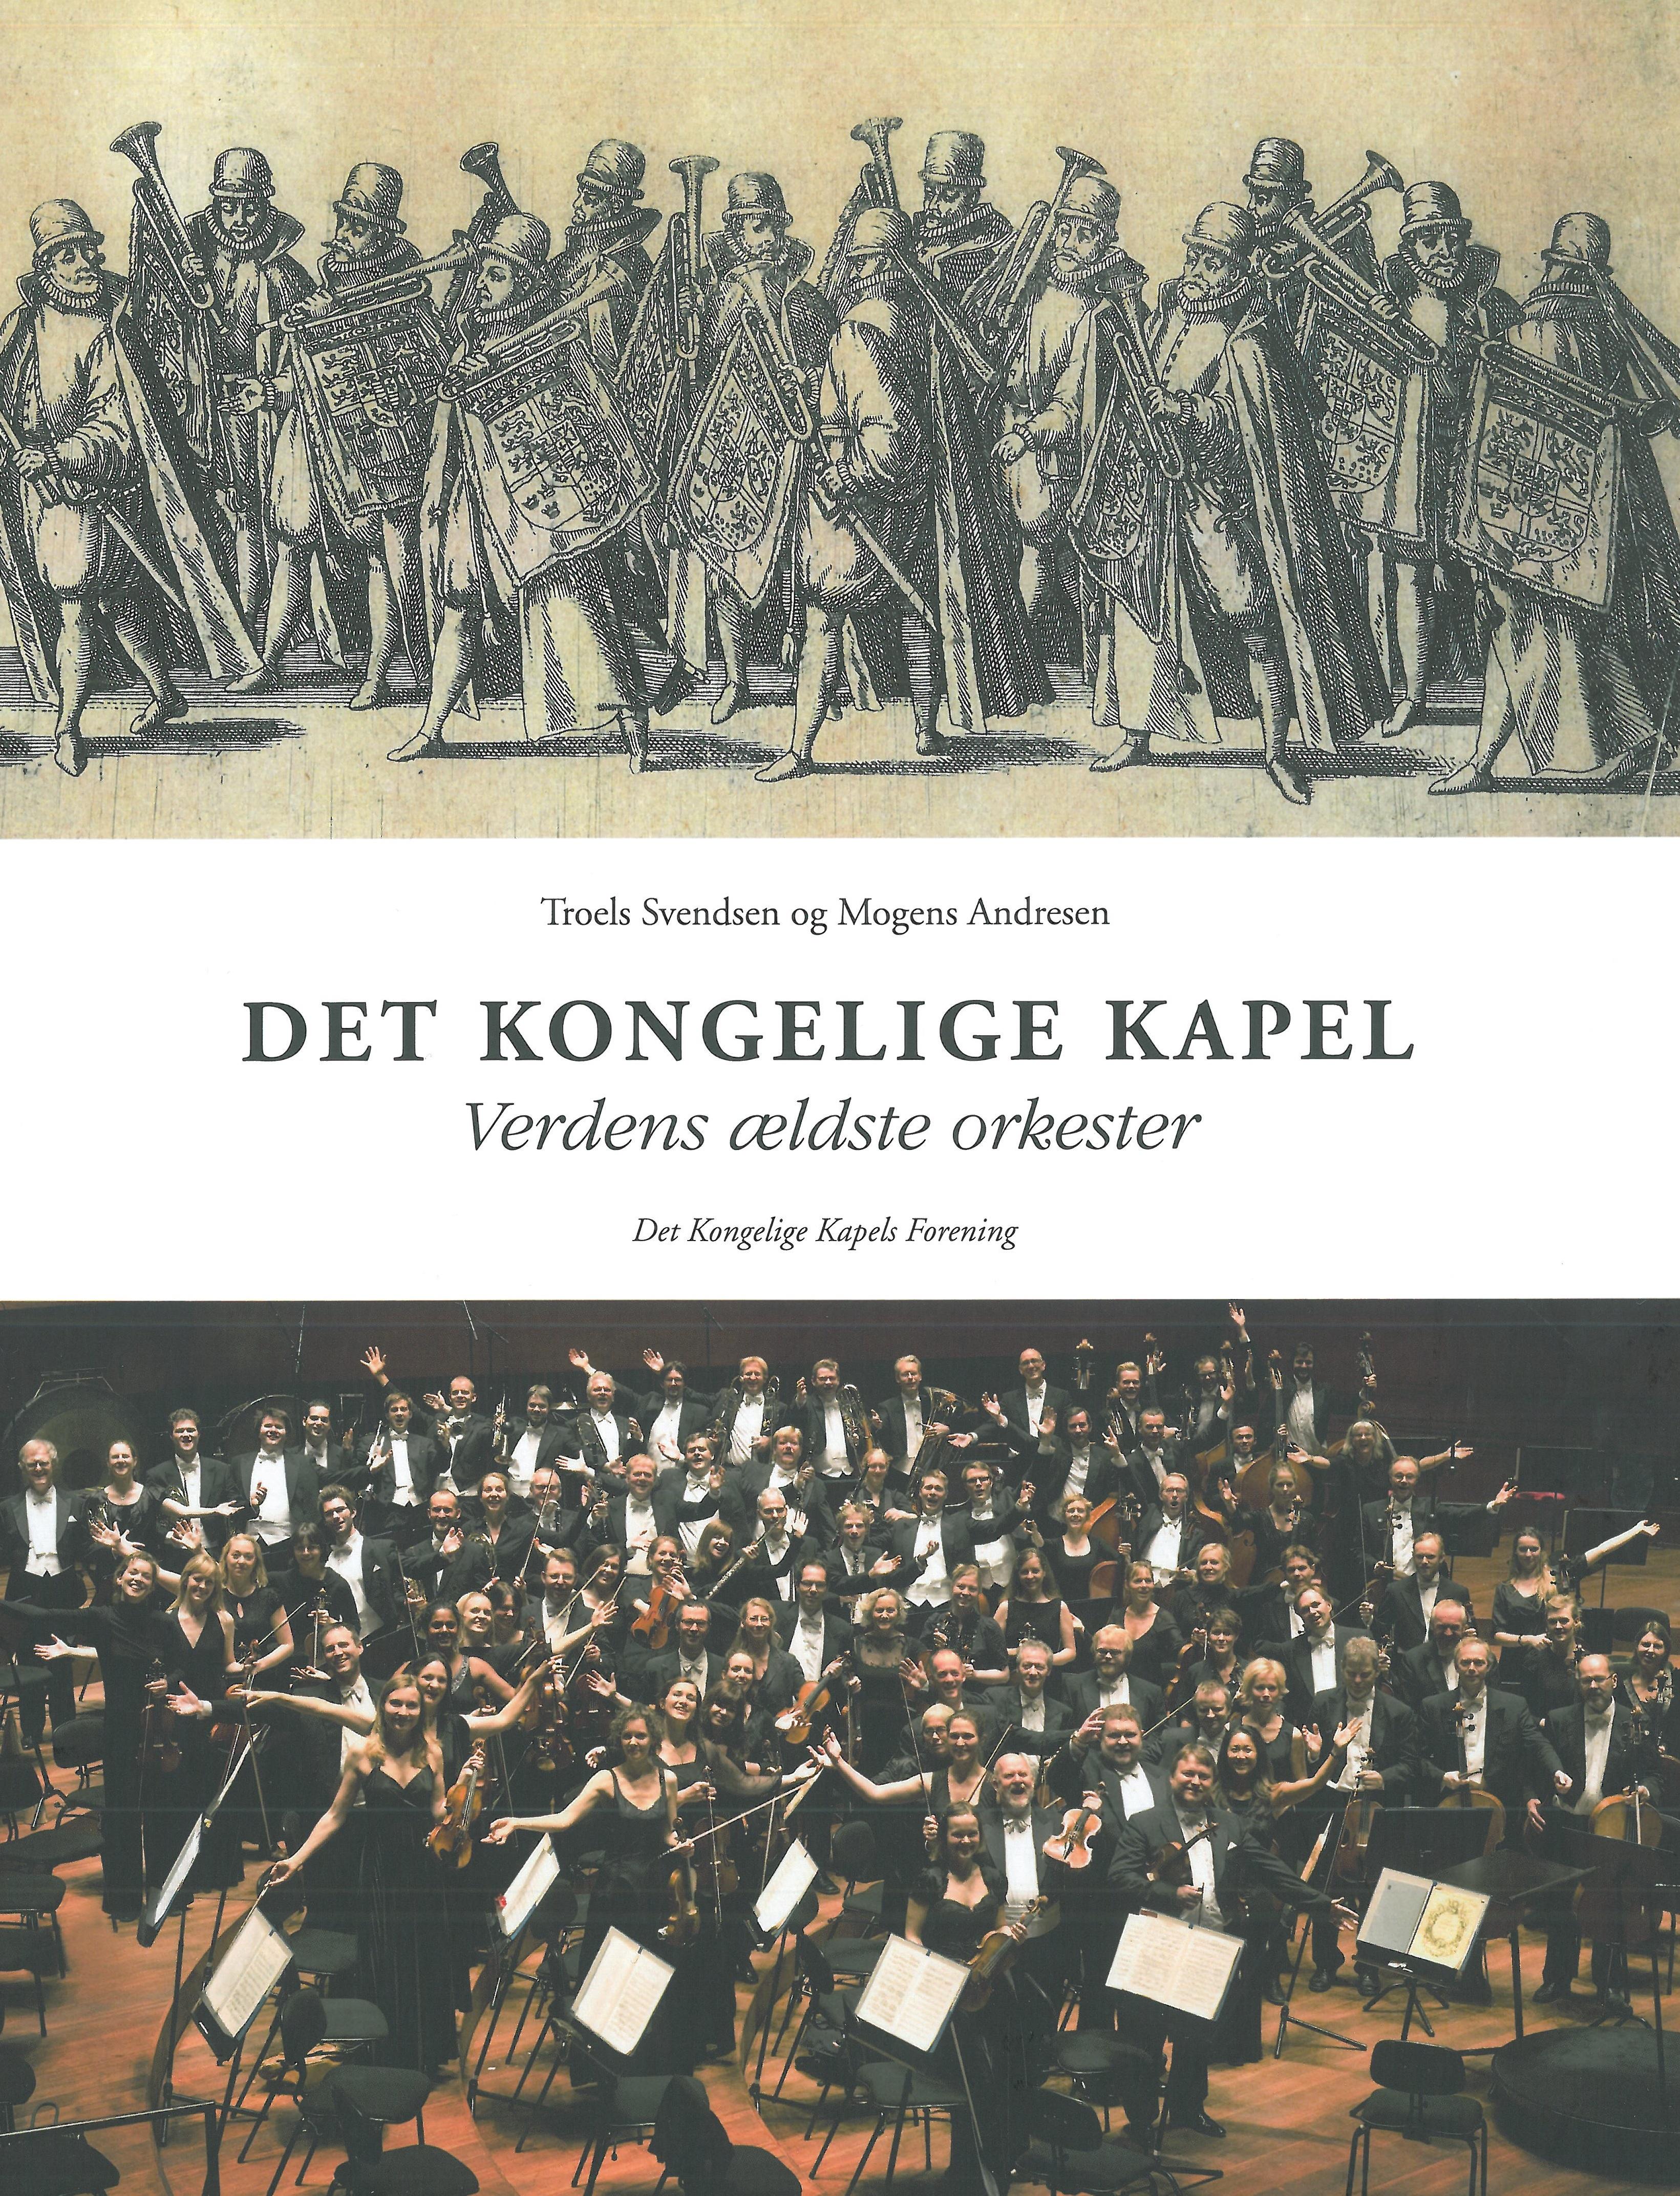 Det Kongelige Kapel Royal Danish Symphony Orchestra - Amsterdam Symphony Orchestra - Bolero de Ravel